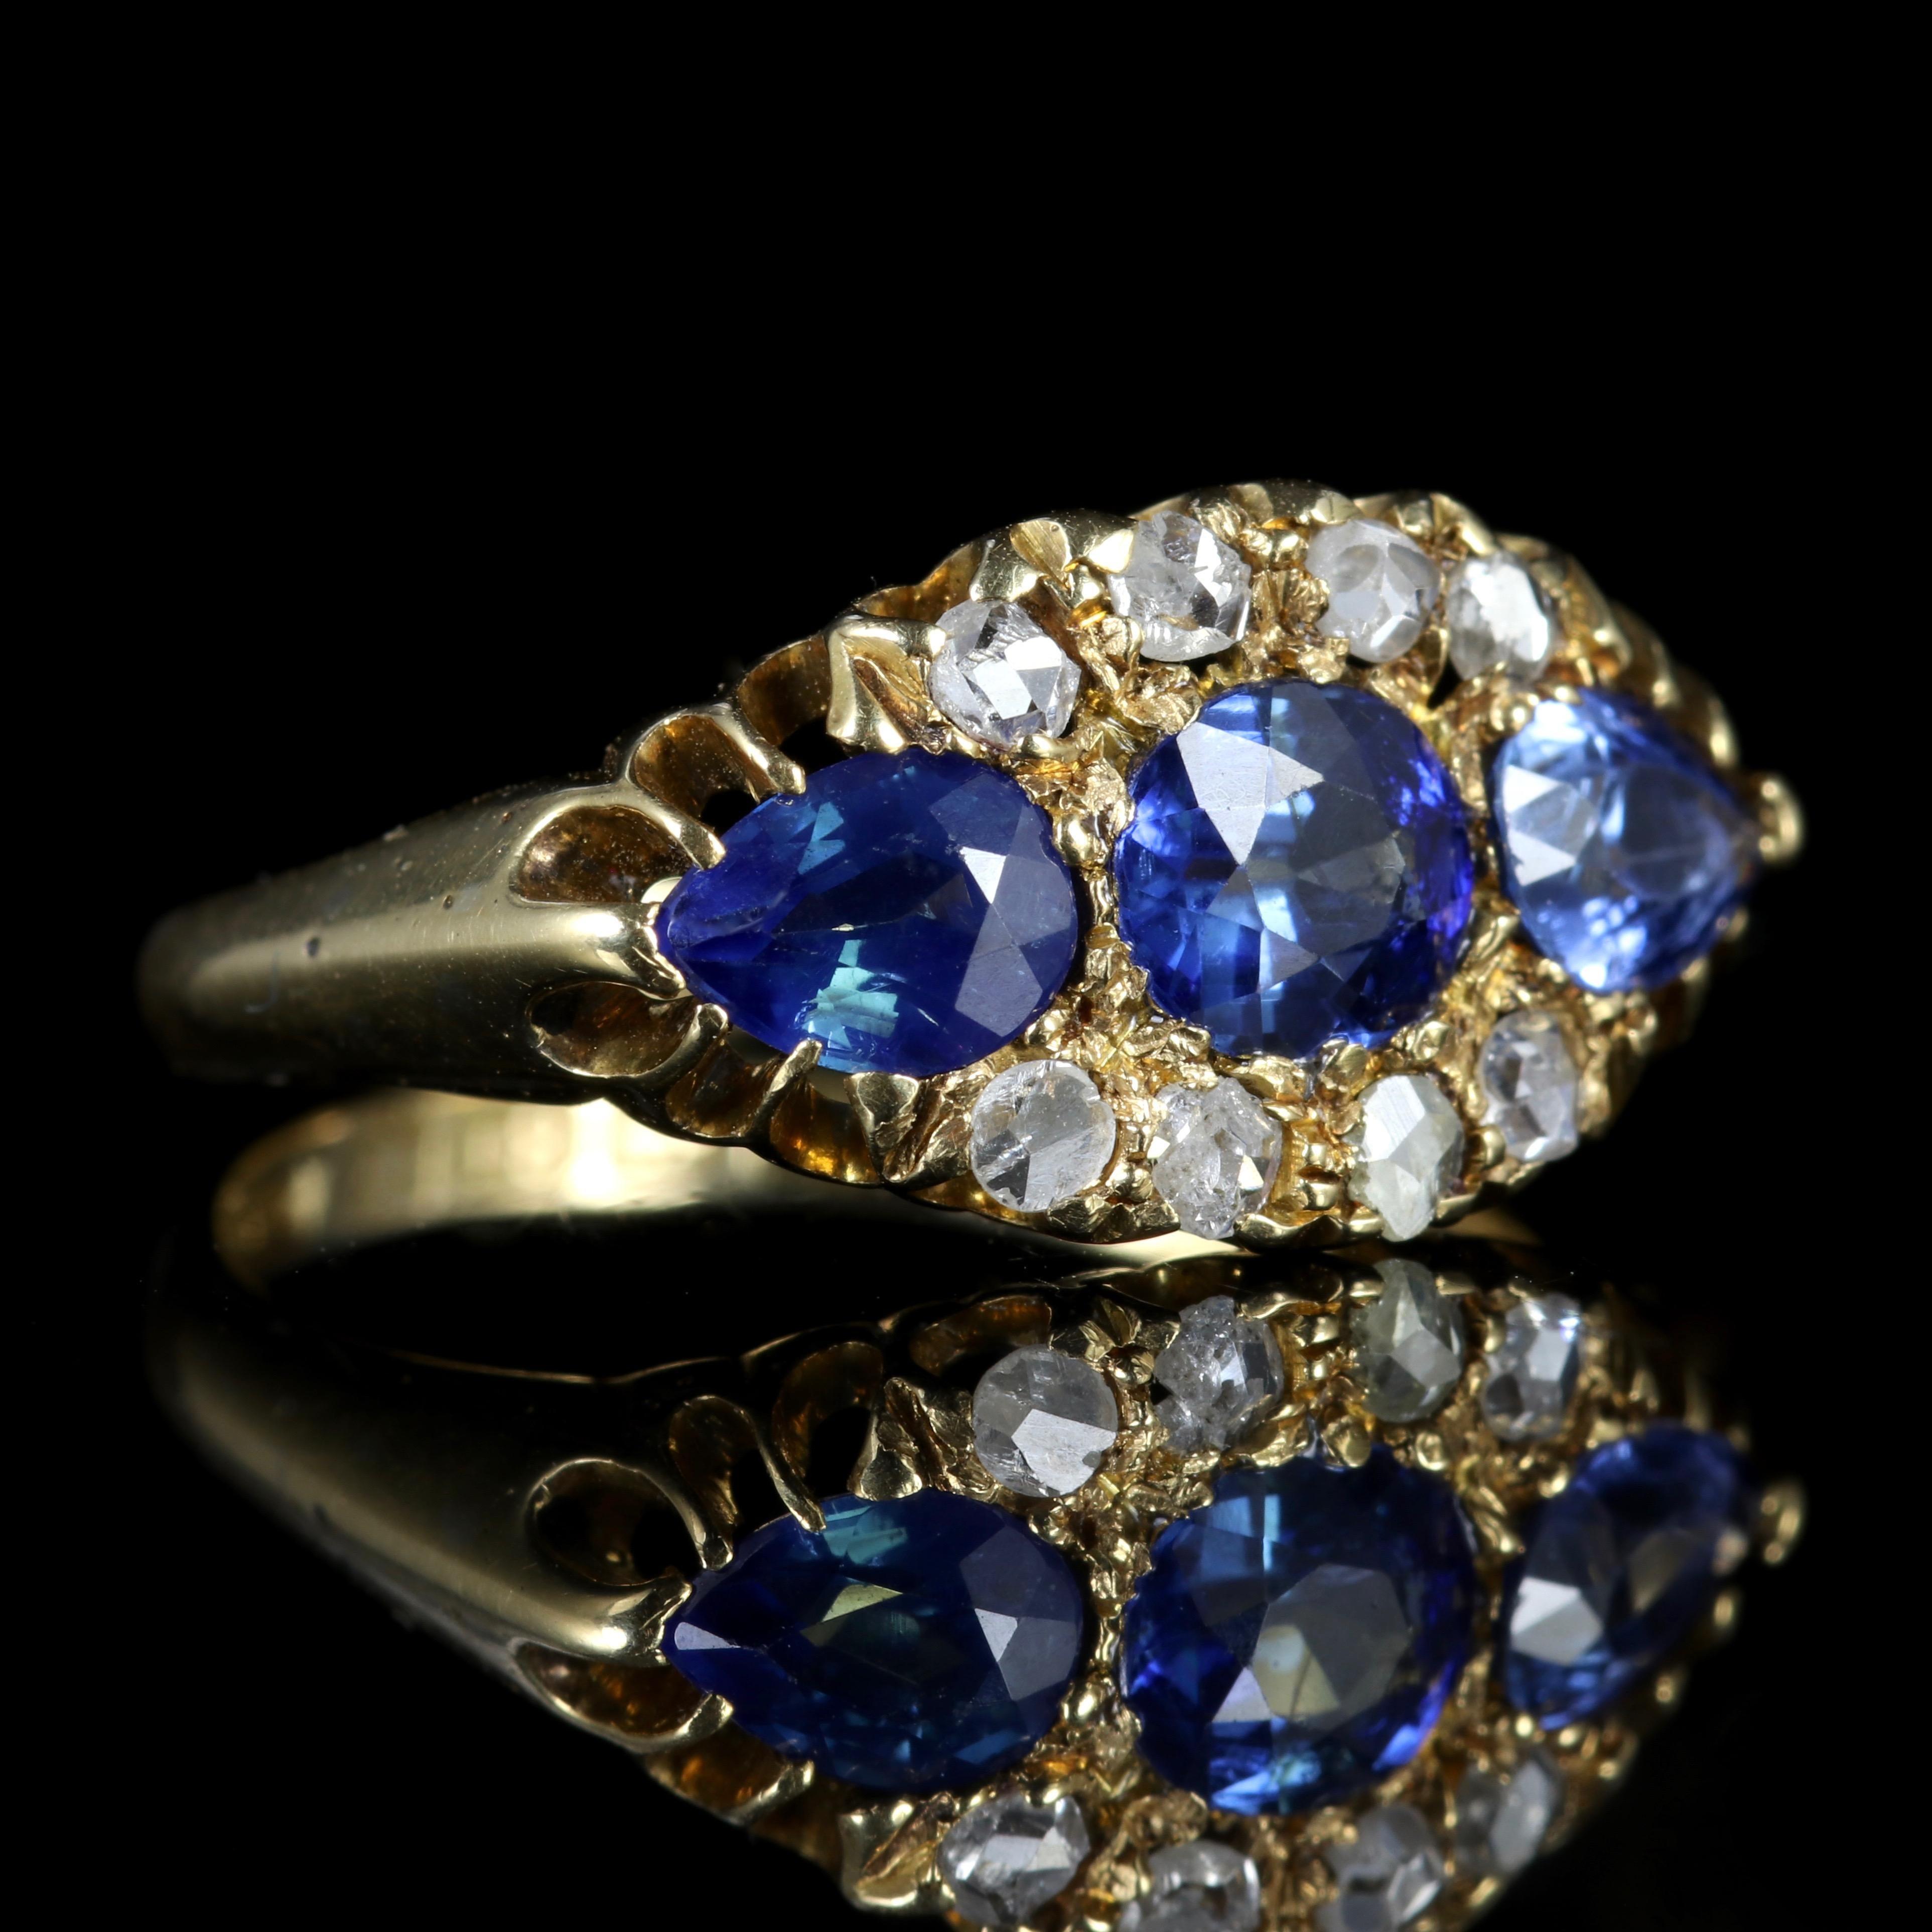 0118e99d16773 Antique Edwardian Sapphire Diamond Trilogy Ring 18 Carat, Dated 1904-1905